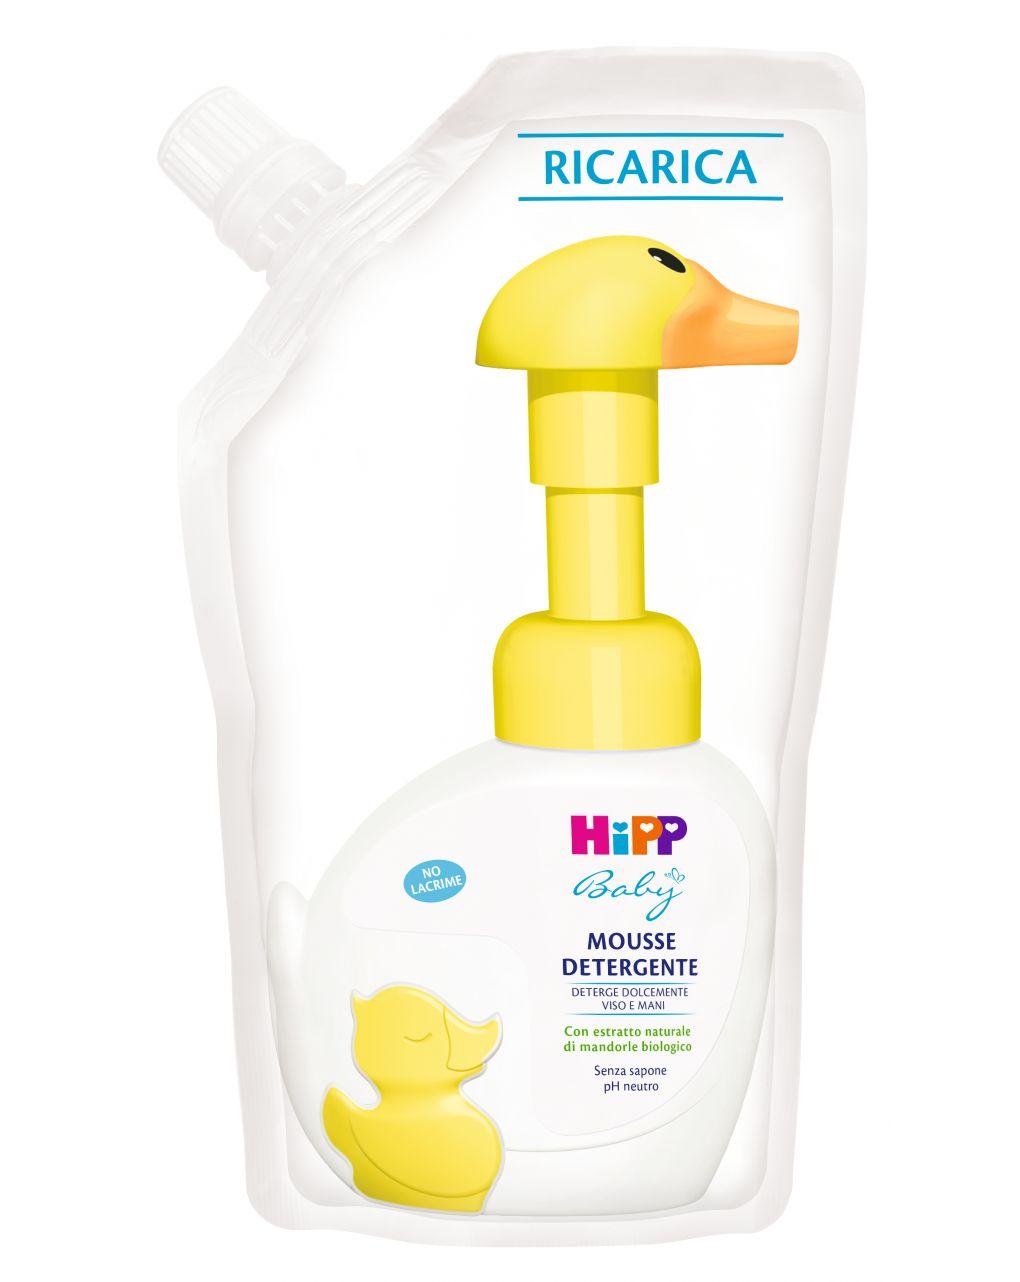 Ricarica mousse paperella 200 ml - Hipp